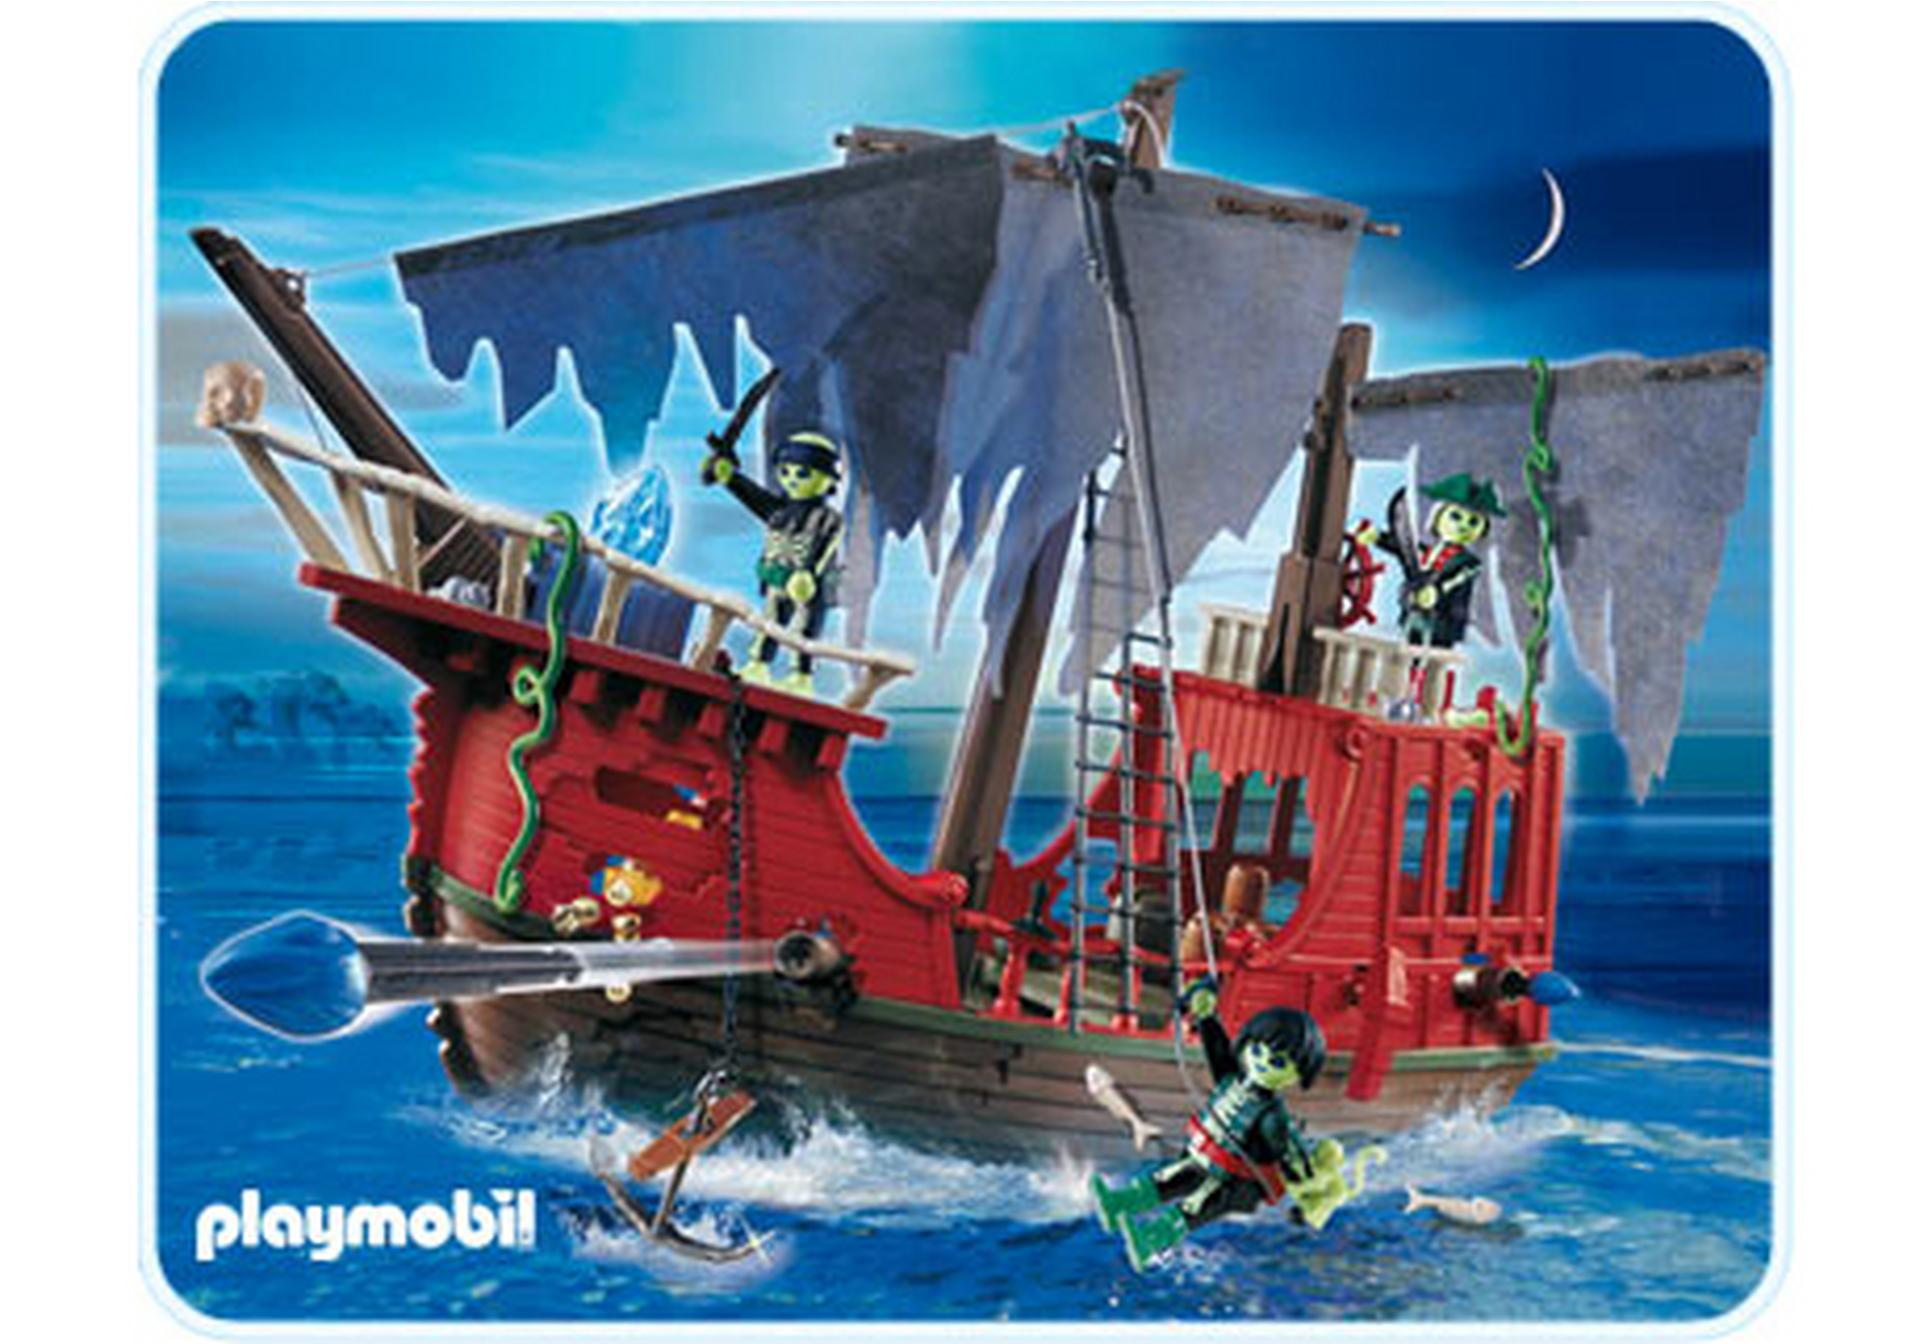 Bateau des pirates fant mes 4806 a playmobil france - Playmobil pirate fantome ...